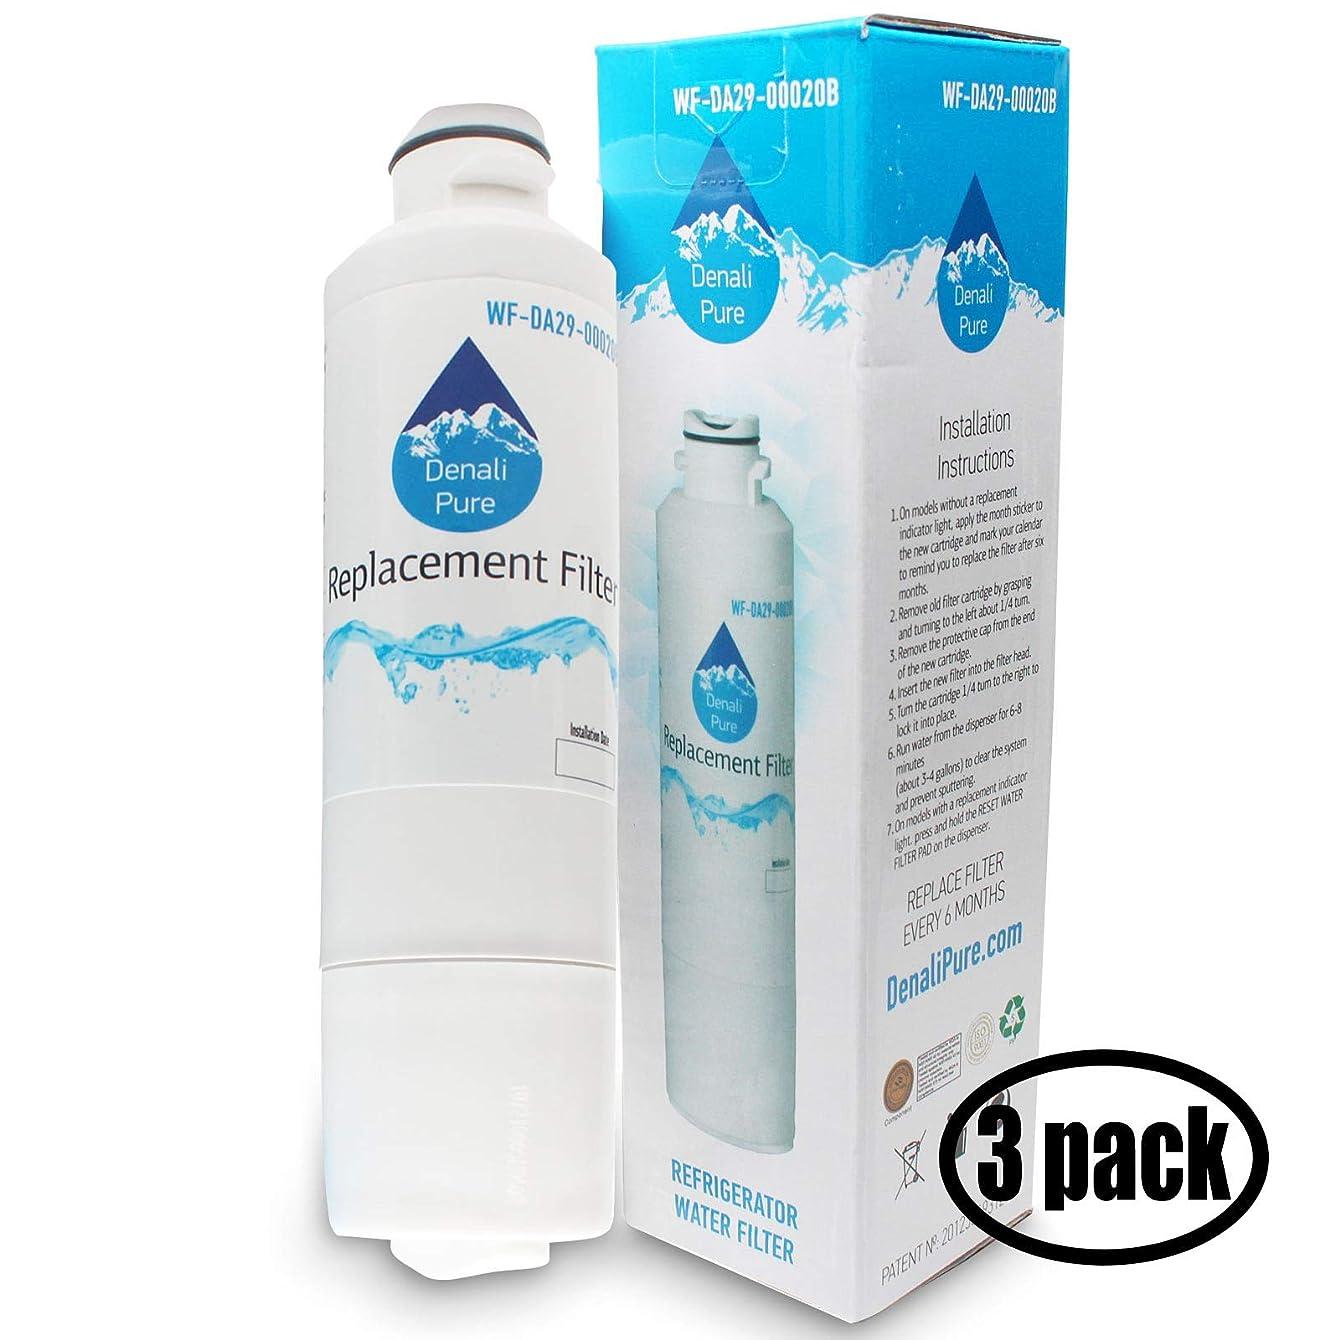 Denali Pure Replacement Samsung DA97-08006A-B Refrigerator Water Filter - Compatible Samsung DA97-08006A-B Fridge Water Filter Cartridge (Pack of 3)